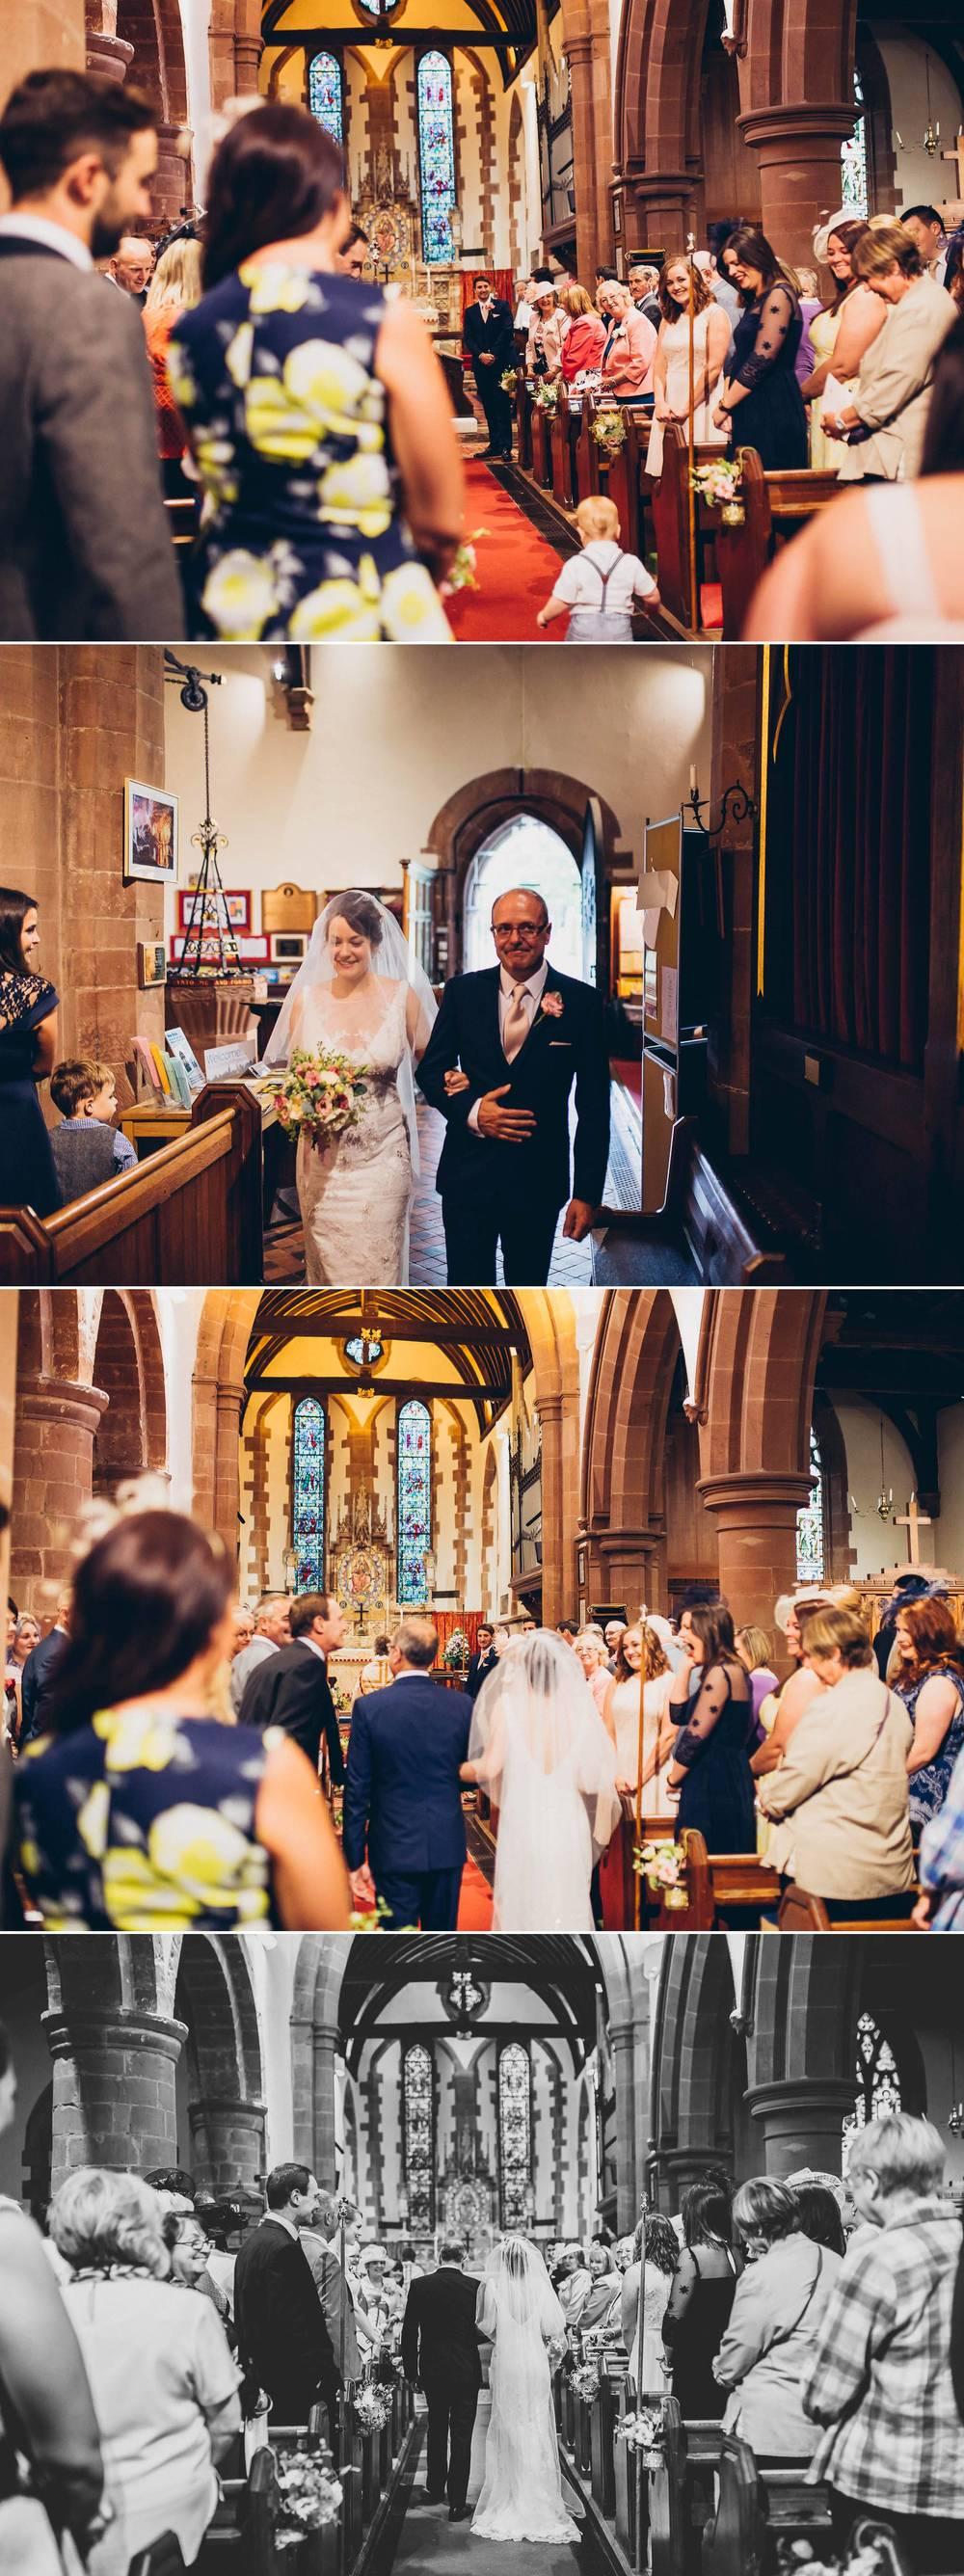 pendrell-hall-wedding-photography 5.jpg